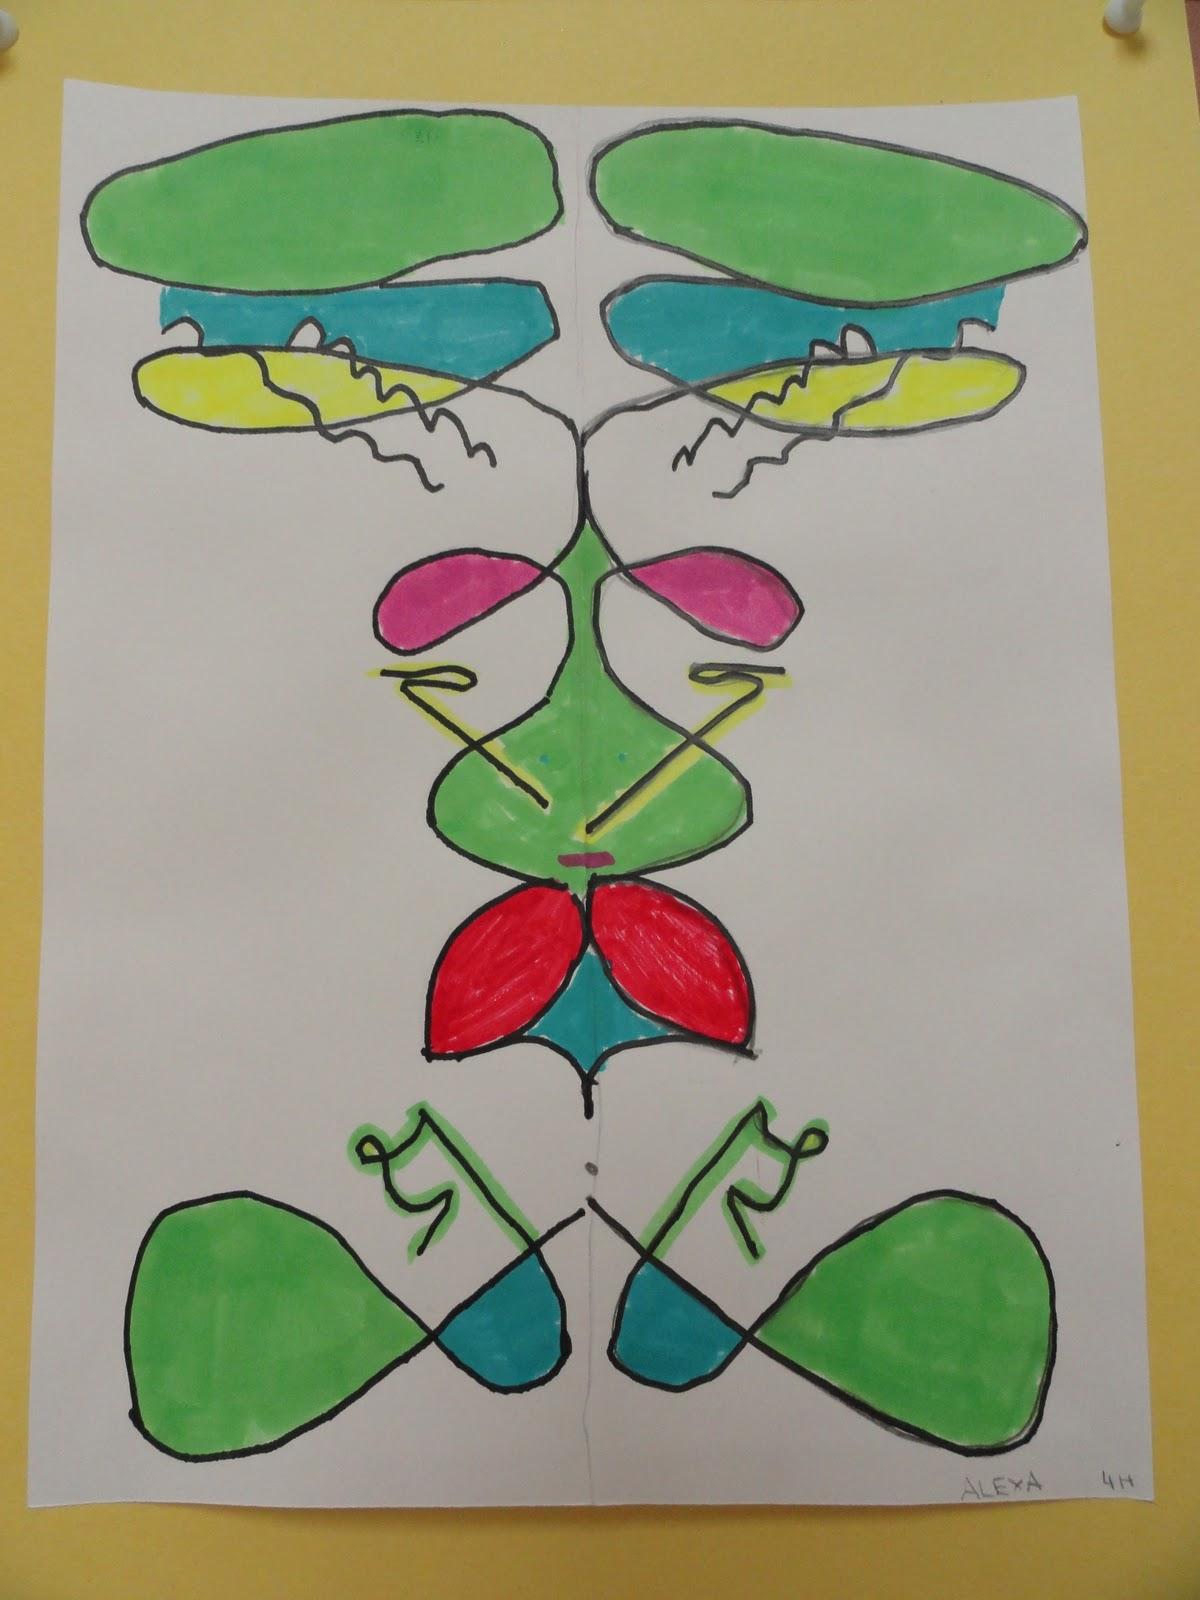 Sinking Springs Art 4th Grade Symmetrical Name Designs